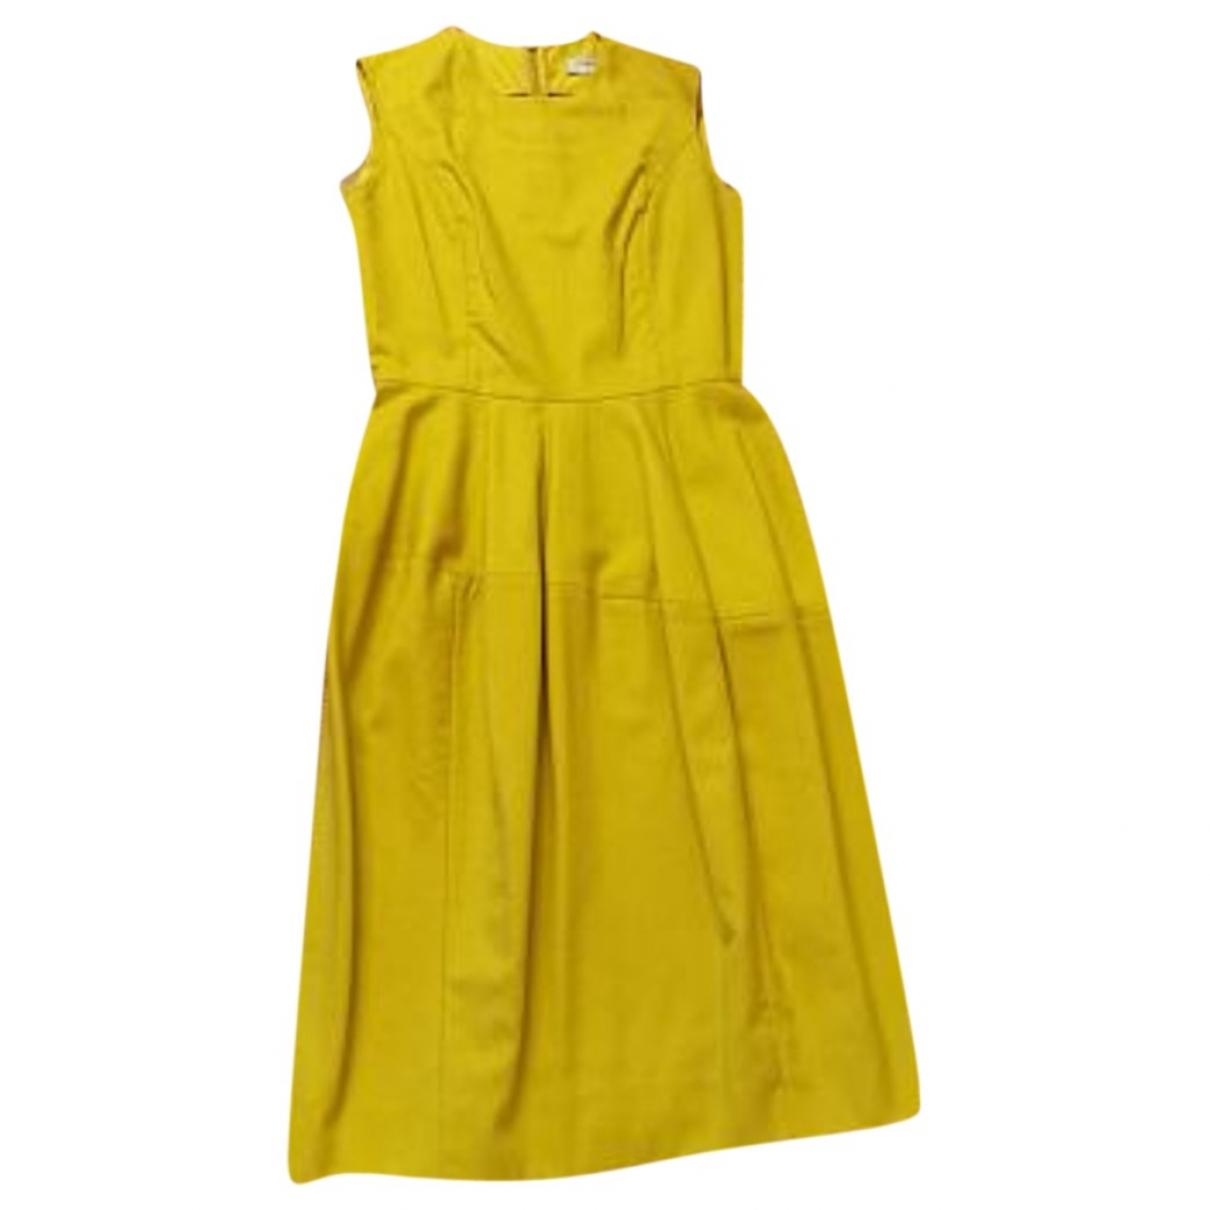 Yves Saint Laurent \N Yellow Wool dress for Women 38 FR